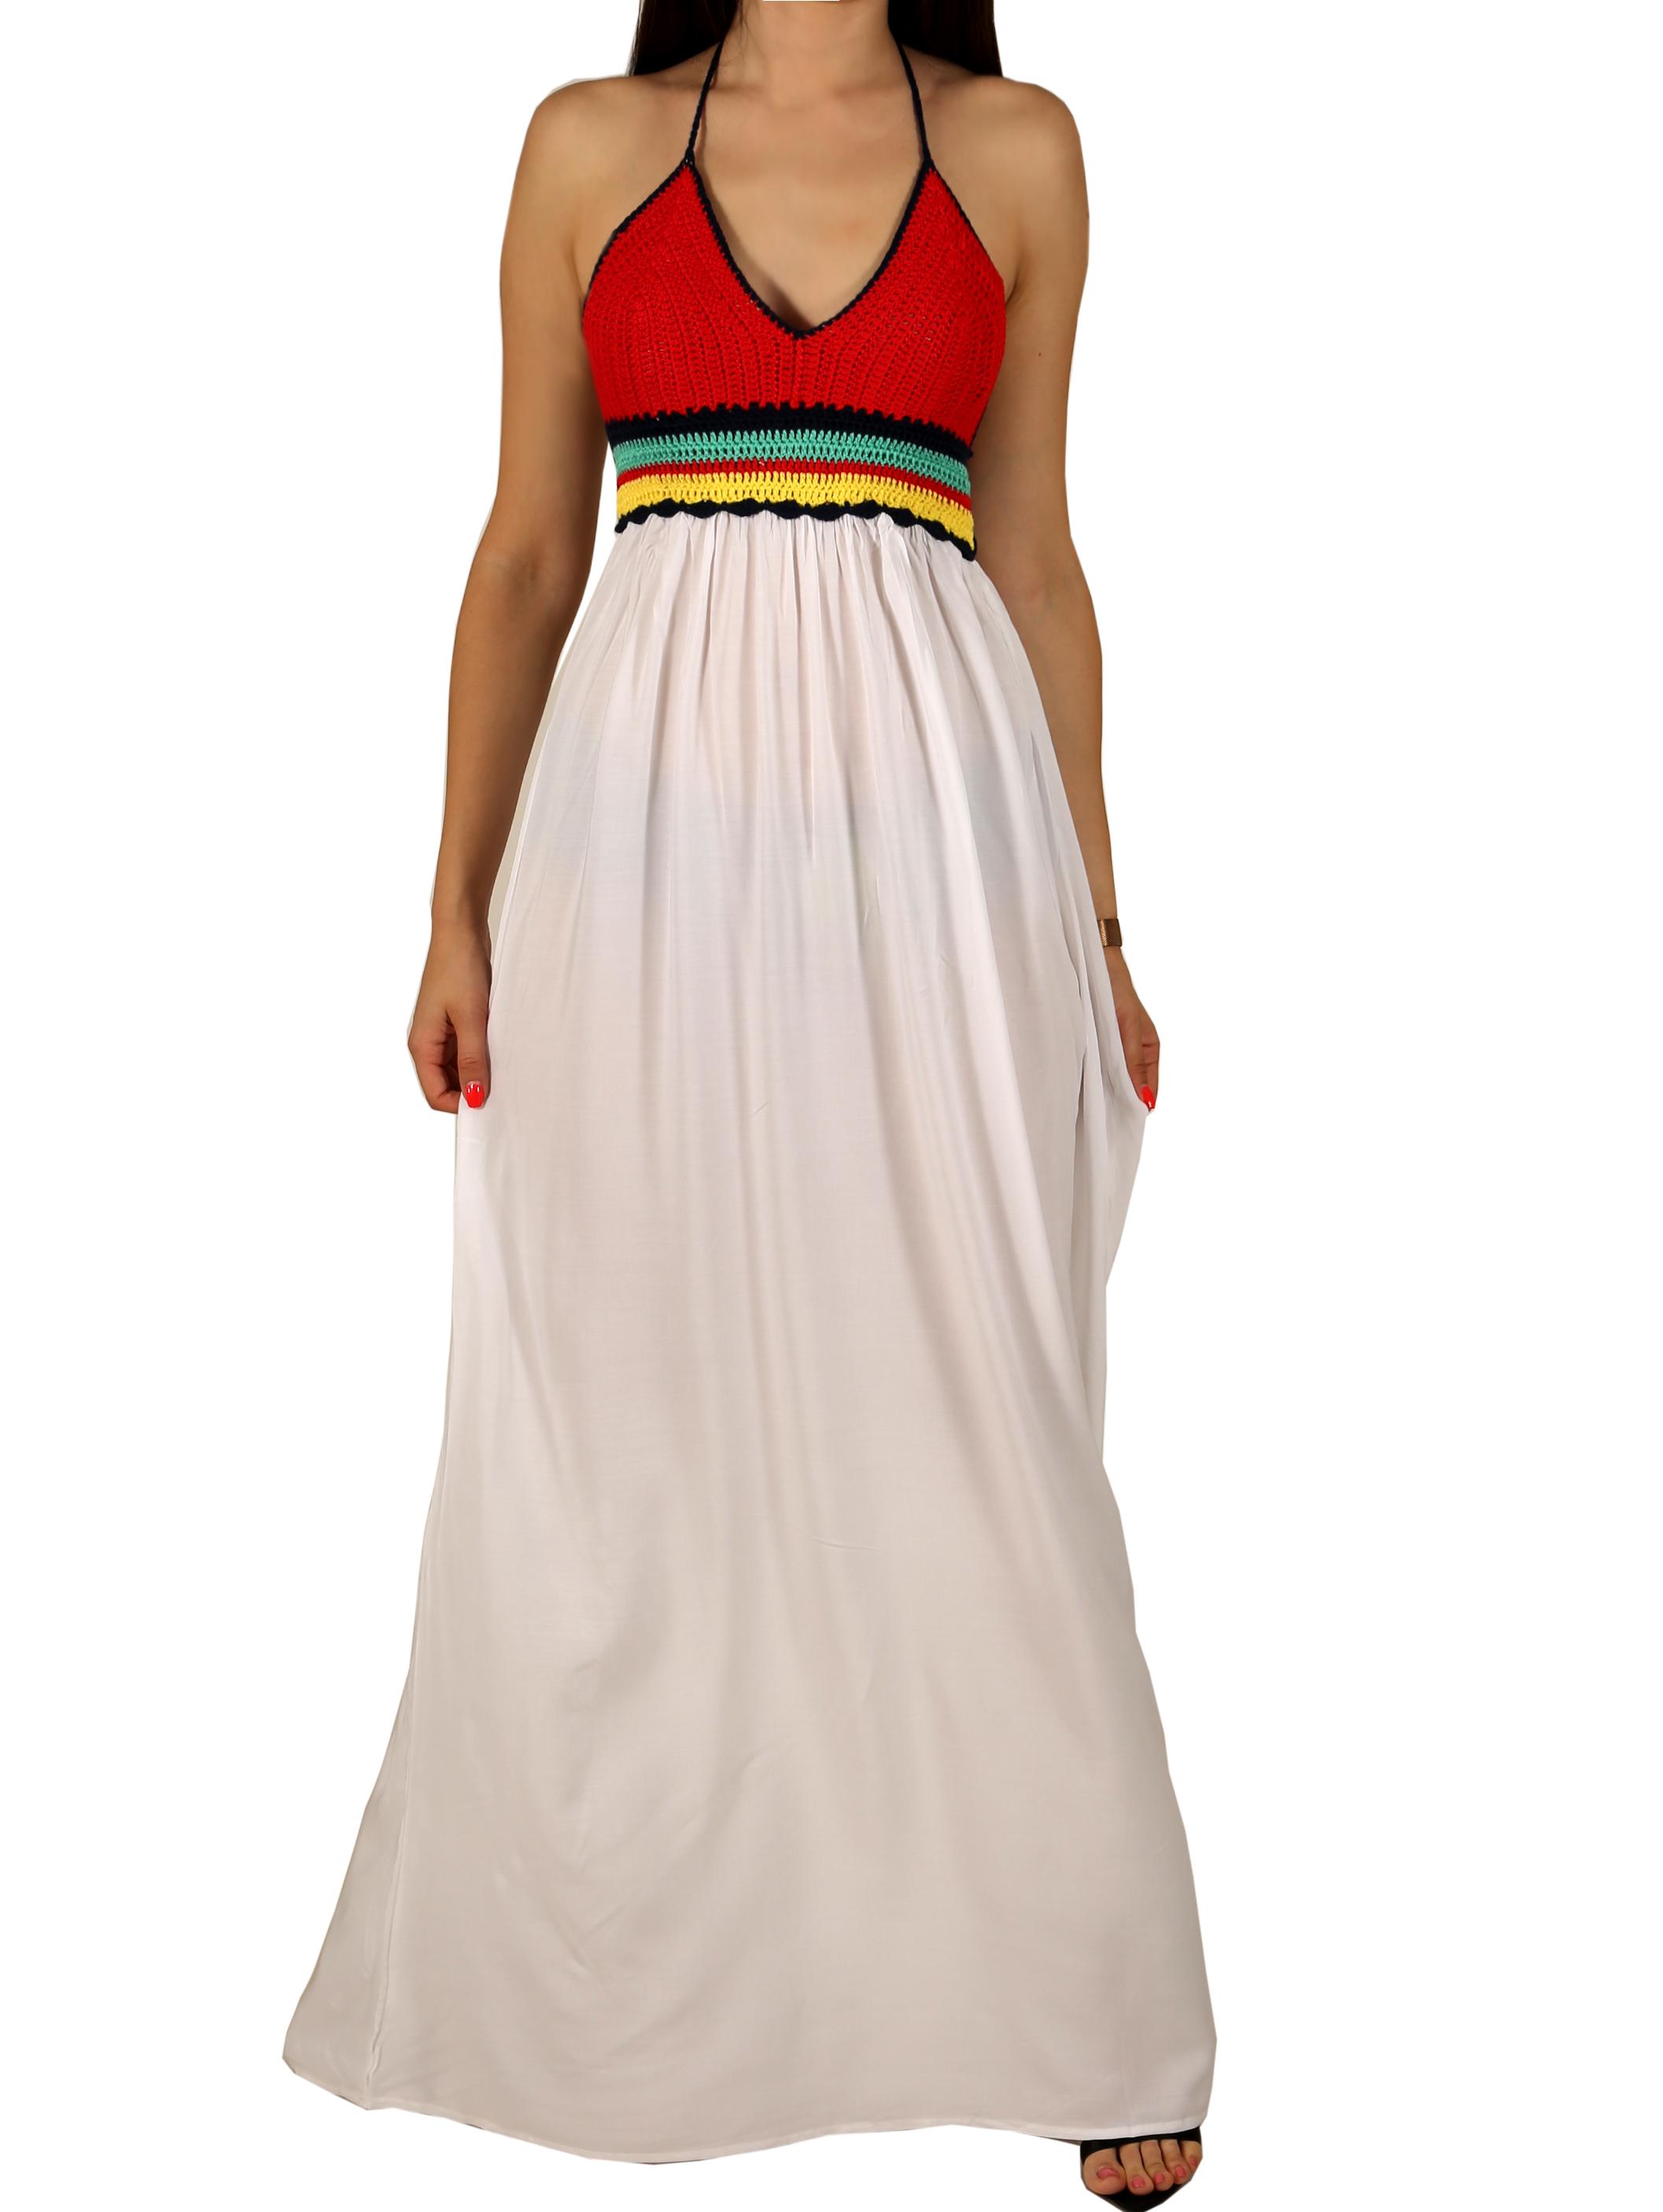 24b73b01129 Дамска рокля YD-353 бяла